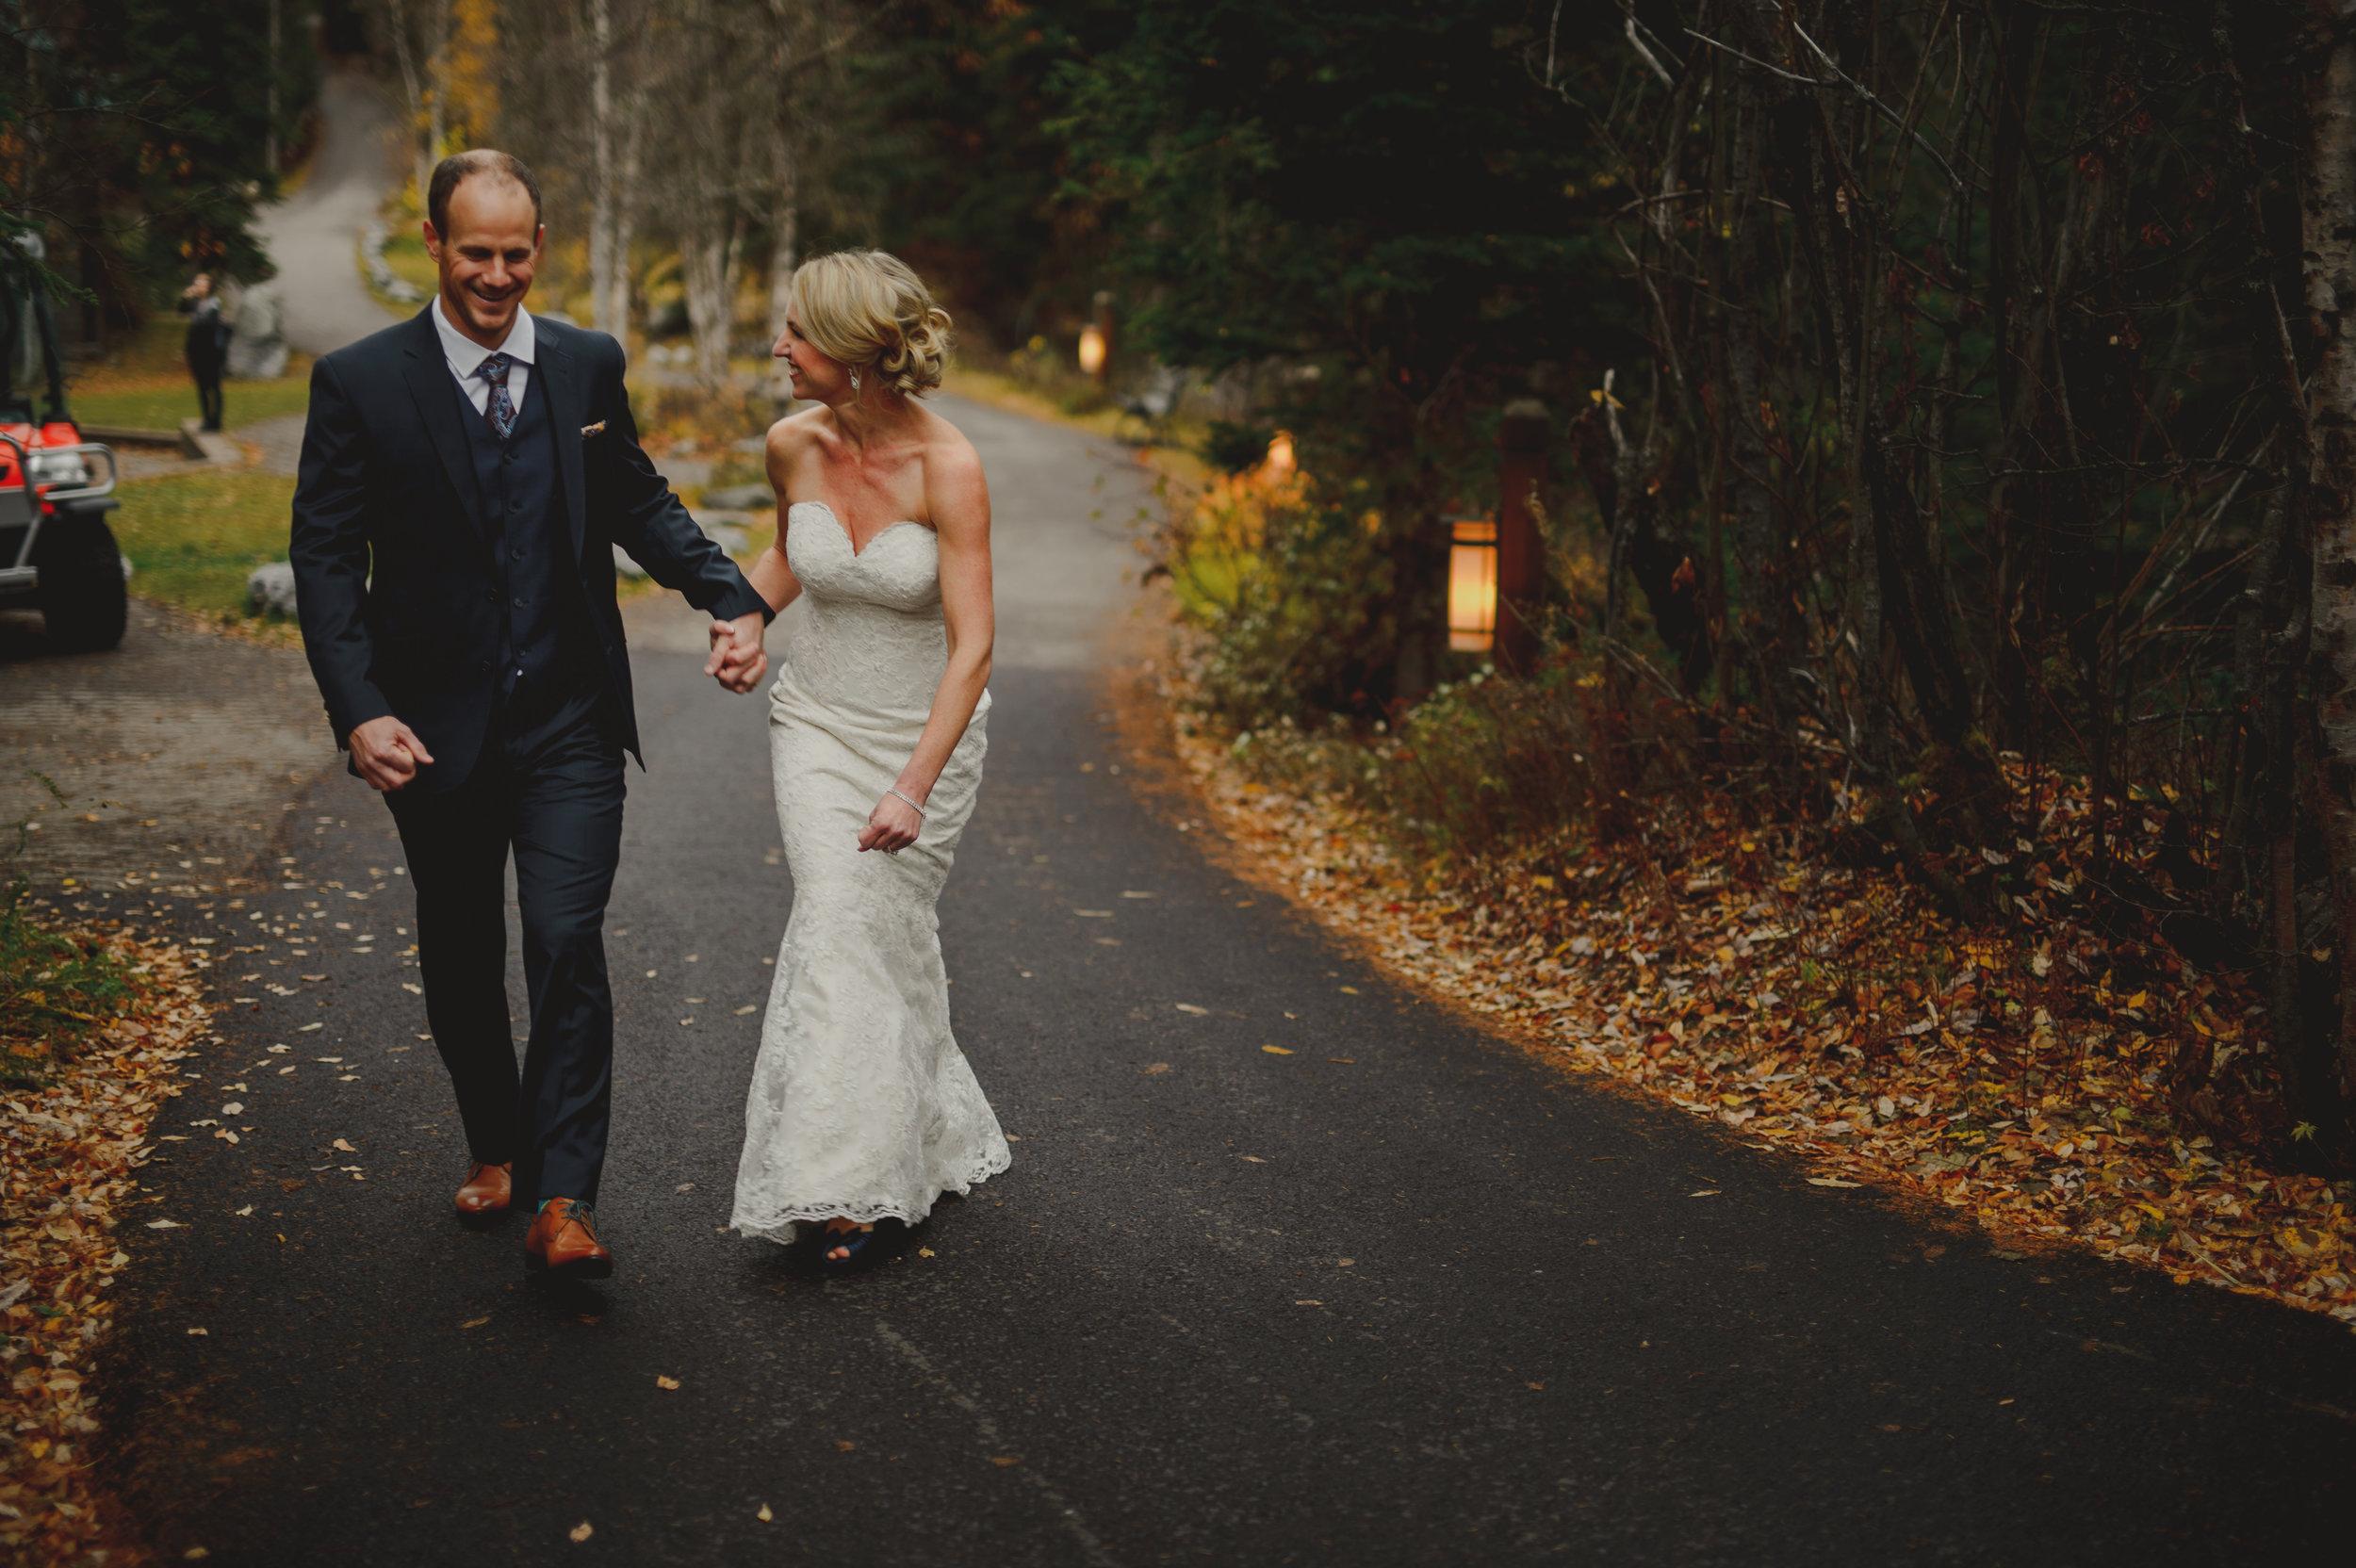 Banff-Wedding-Photographer-13.jpg